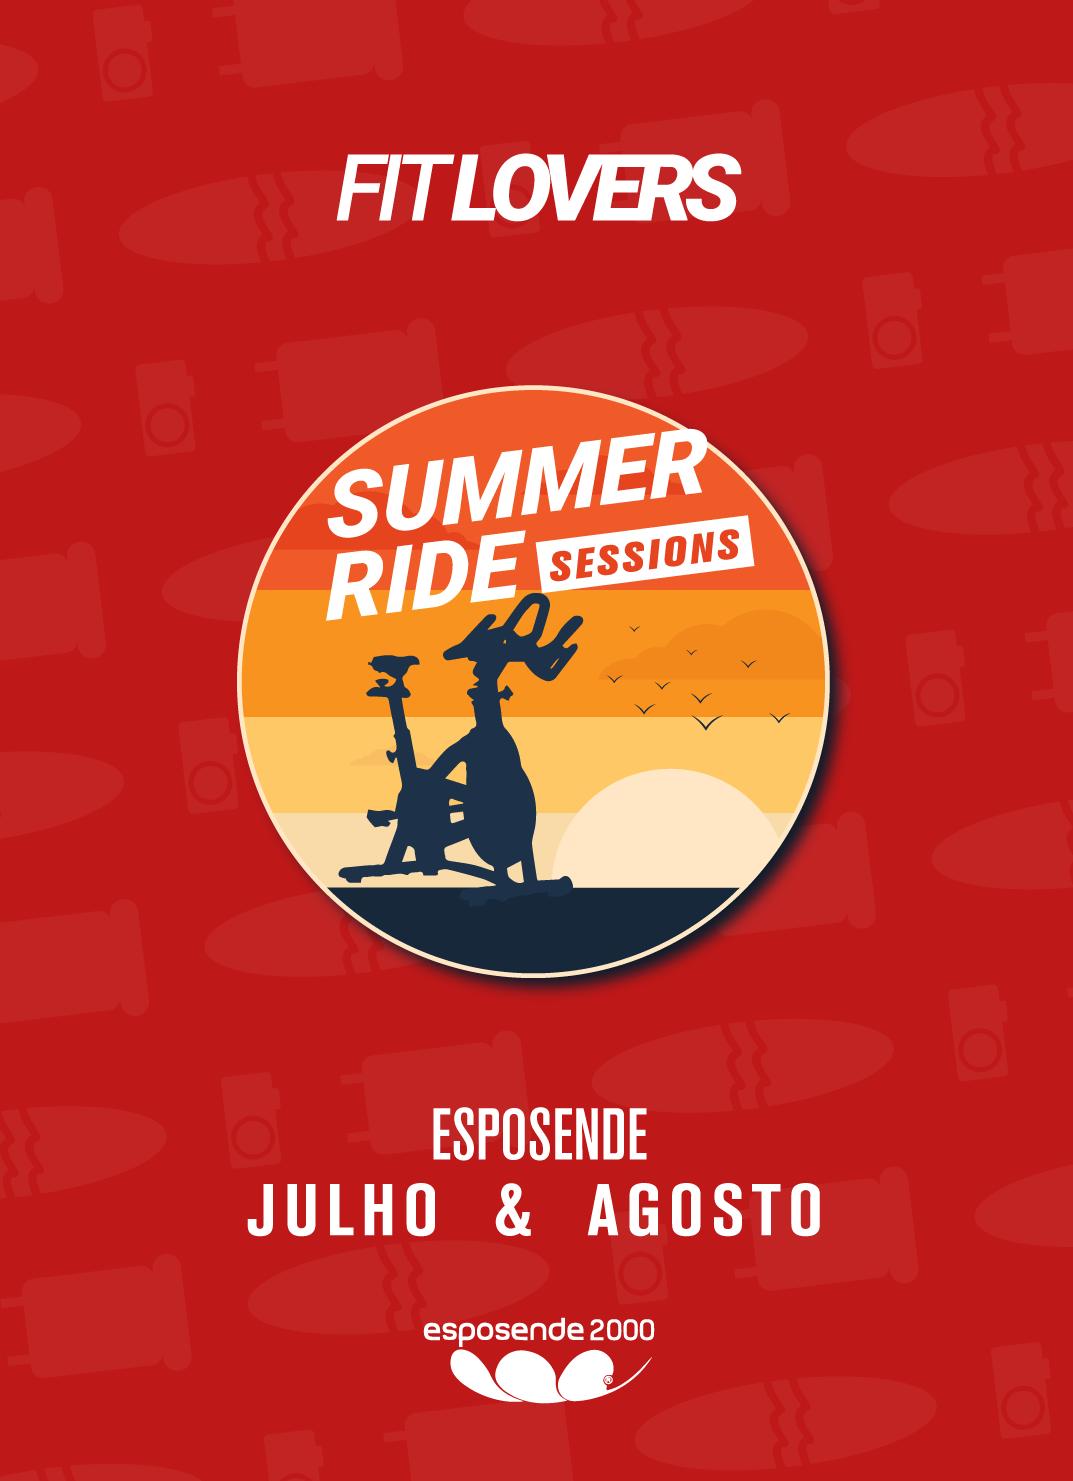 Esposende Summer Ride Sessions